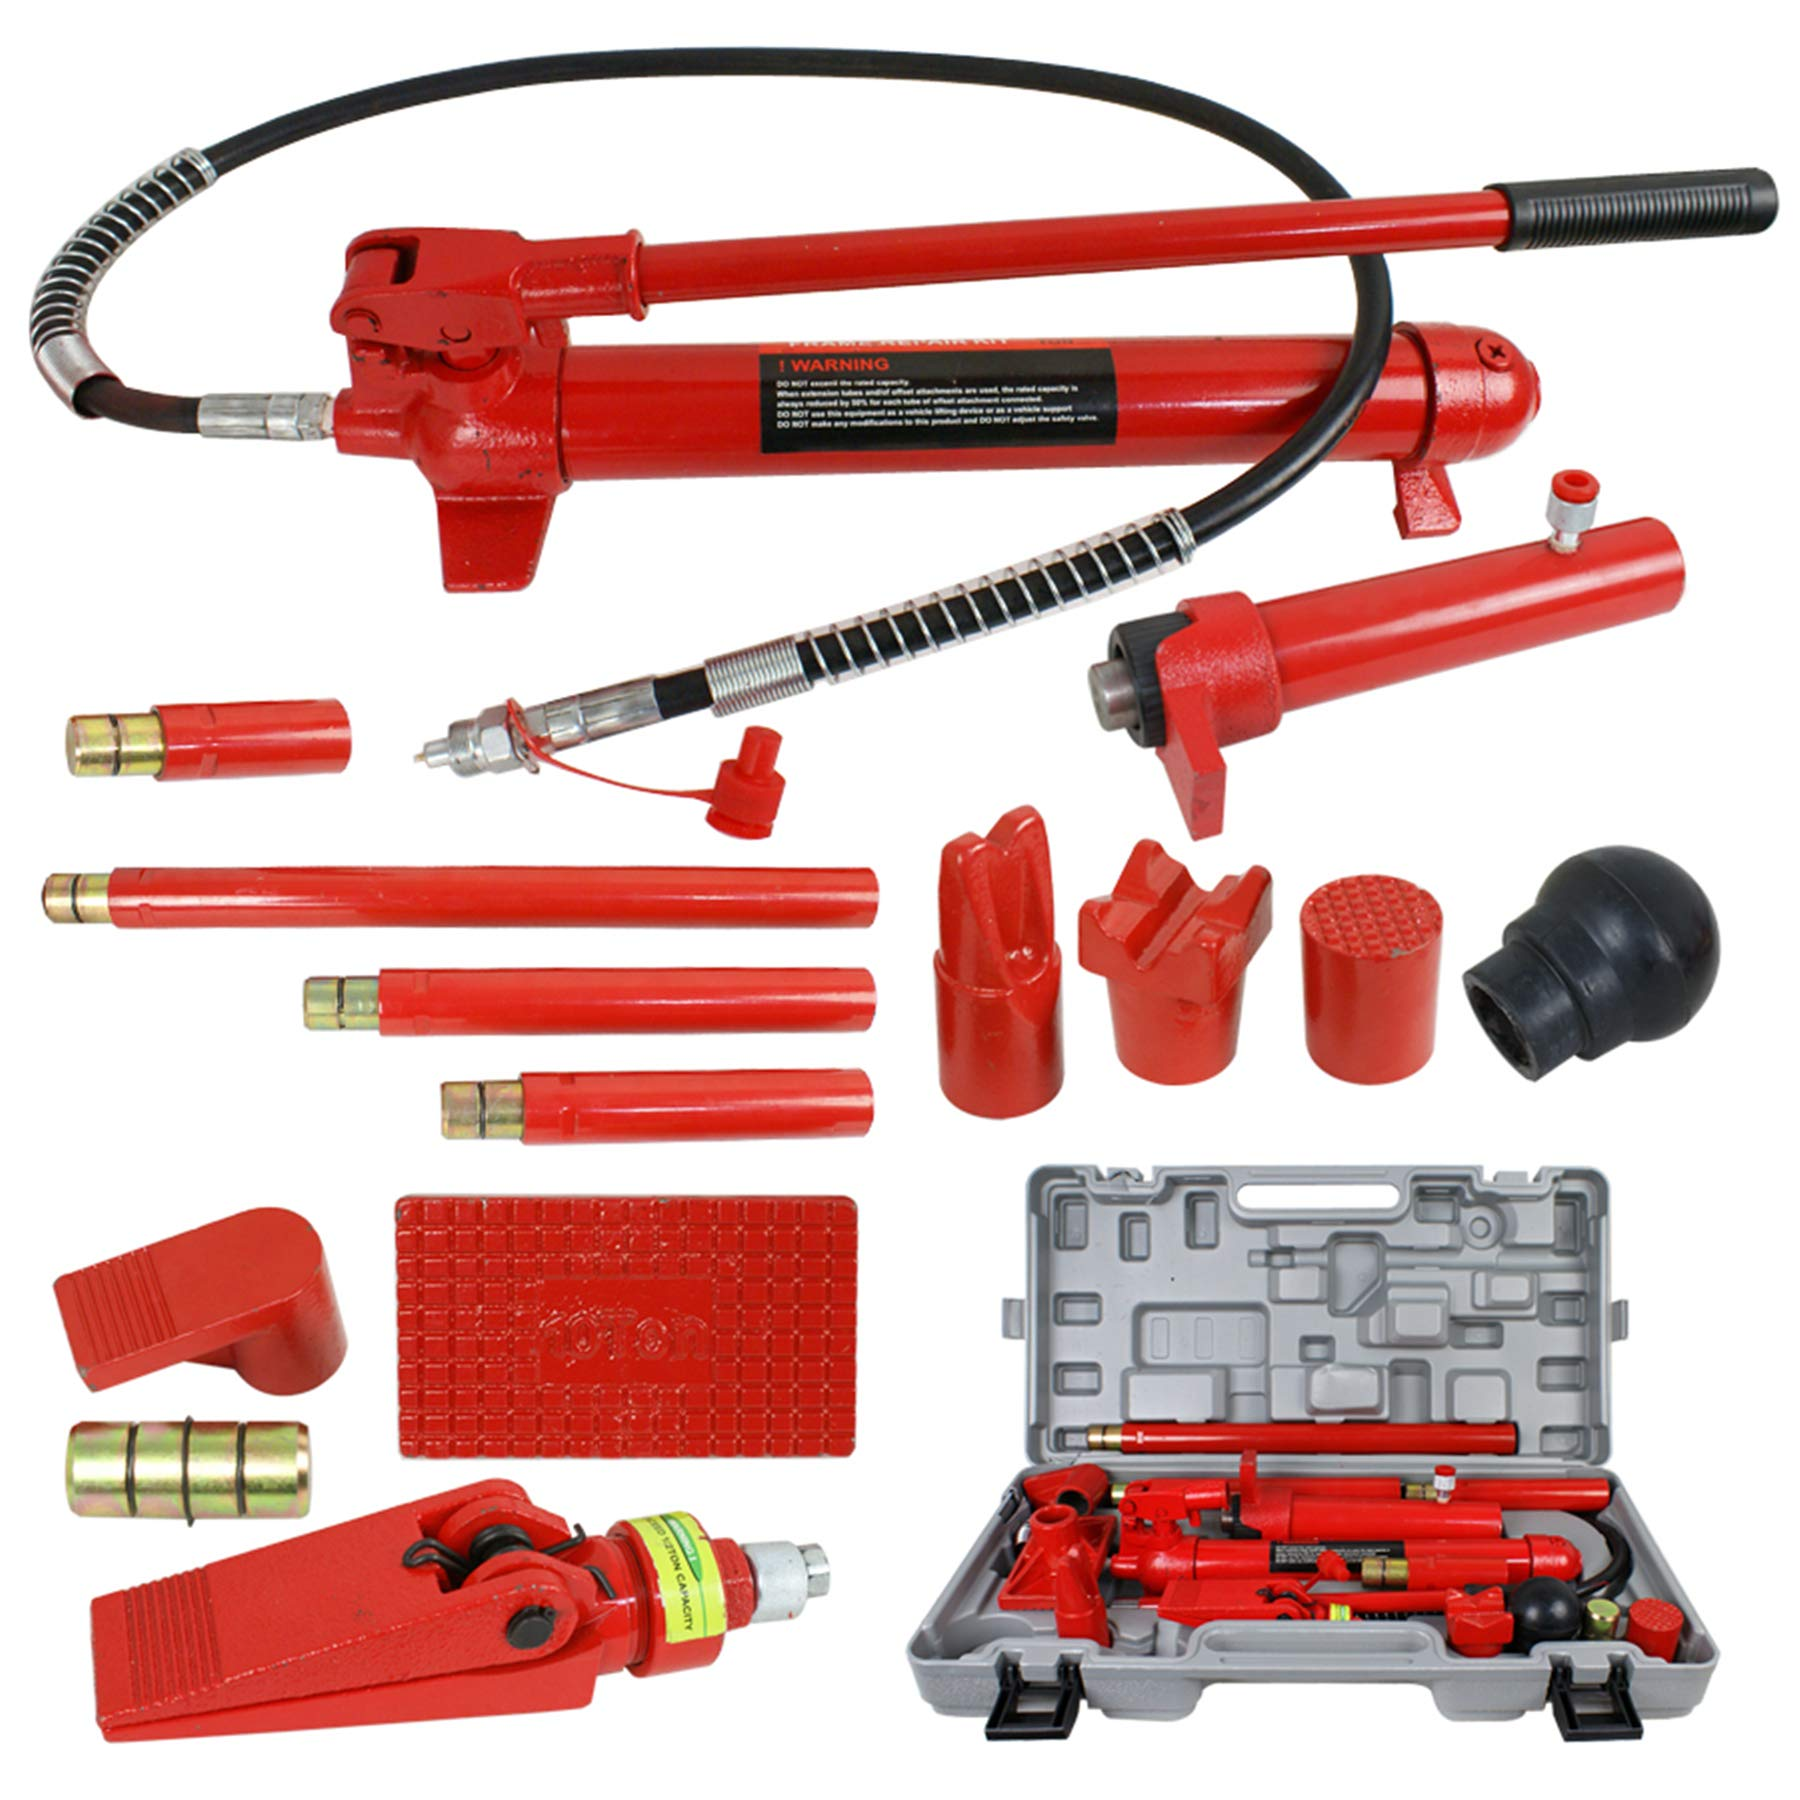 F2C 10 Ton Capacity Porta Power Hydraulic Bottle Jack Ram Pump Auto Body Frame Repair Tool Kit Power Set Auto Tool for Automotive, Truck, Farm and Heavy Equipment/Construction